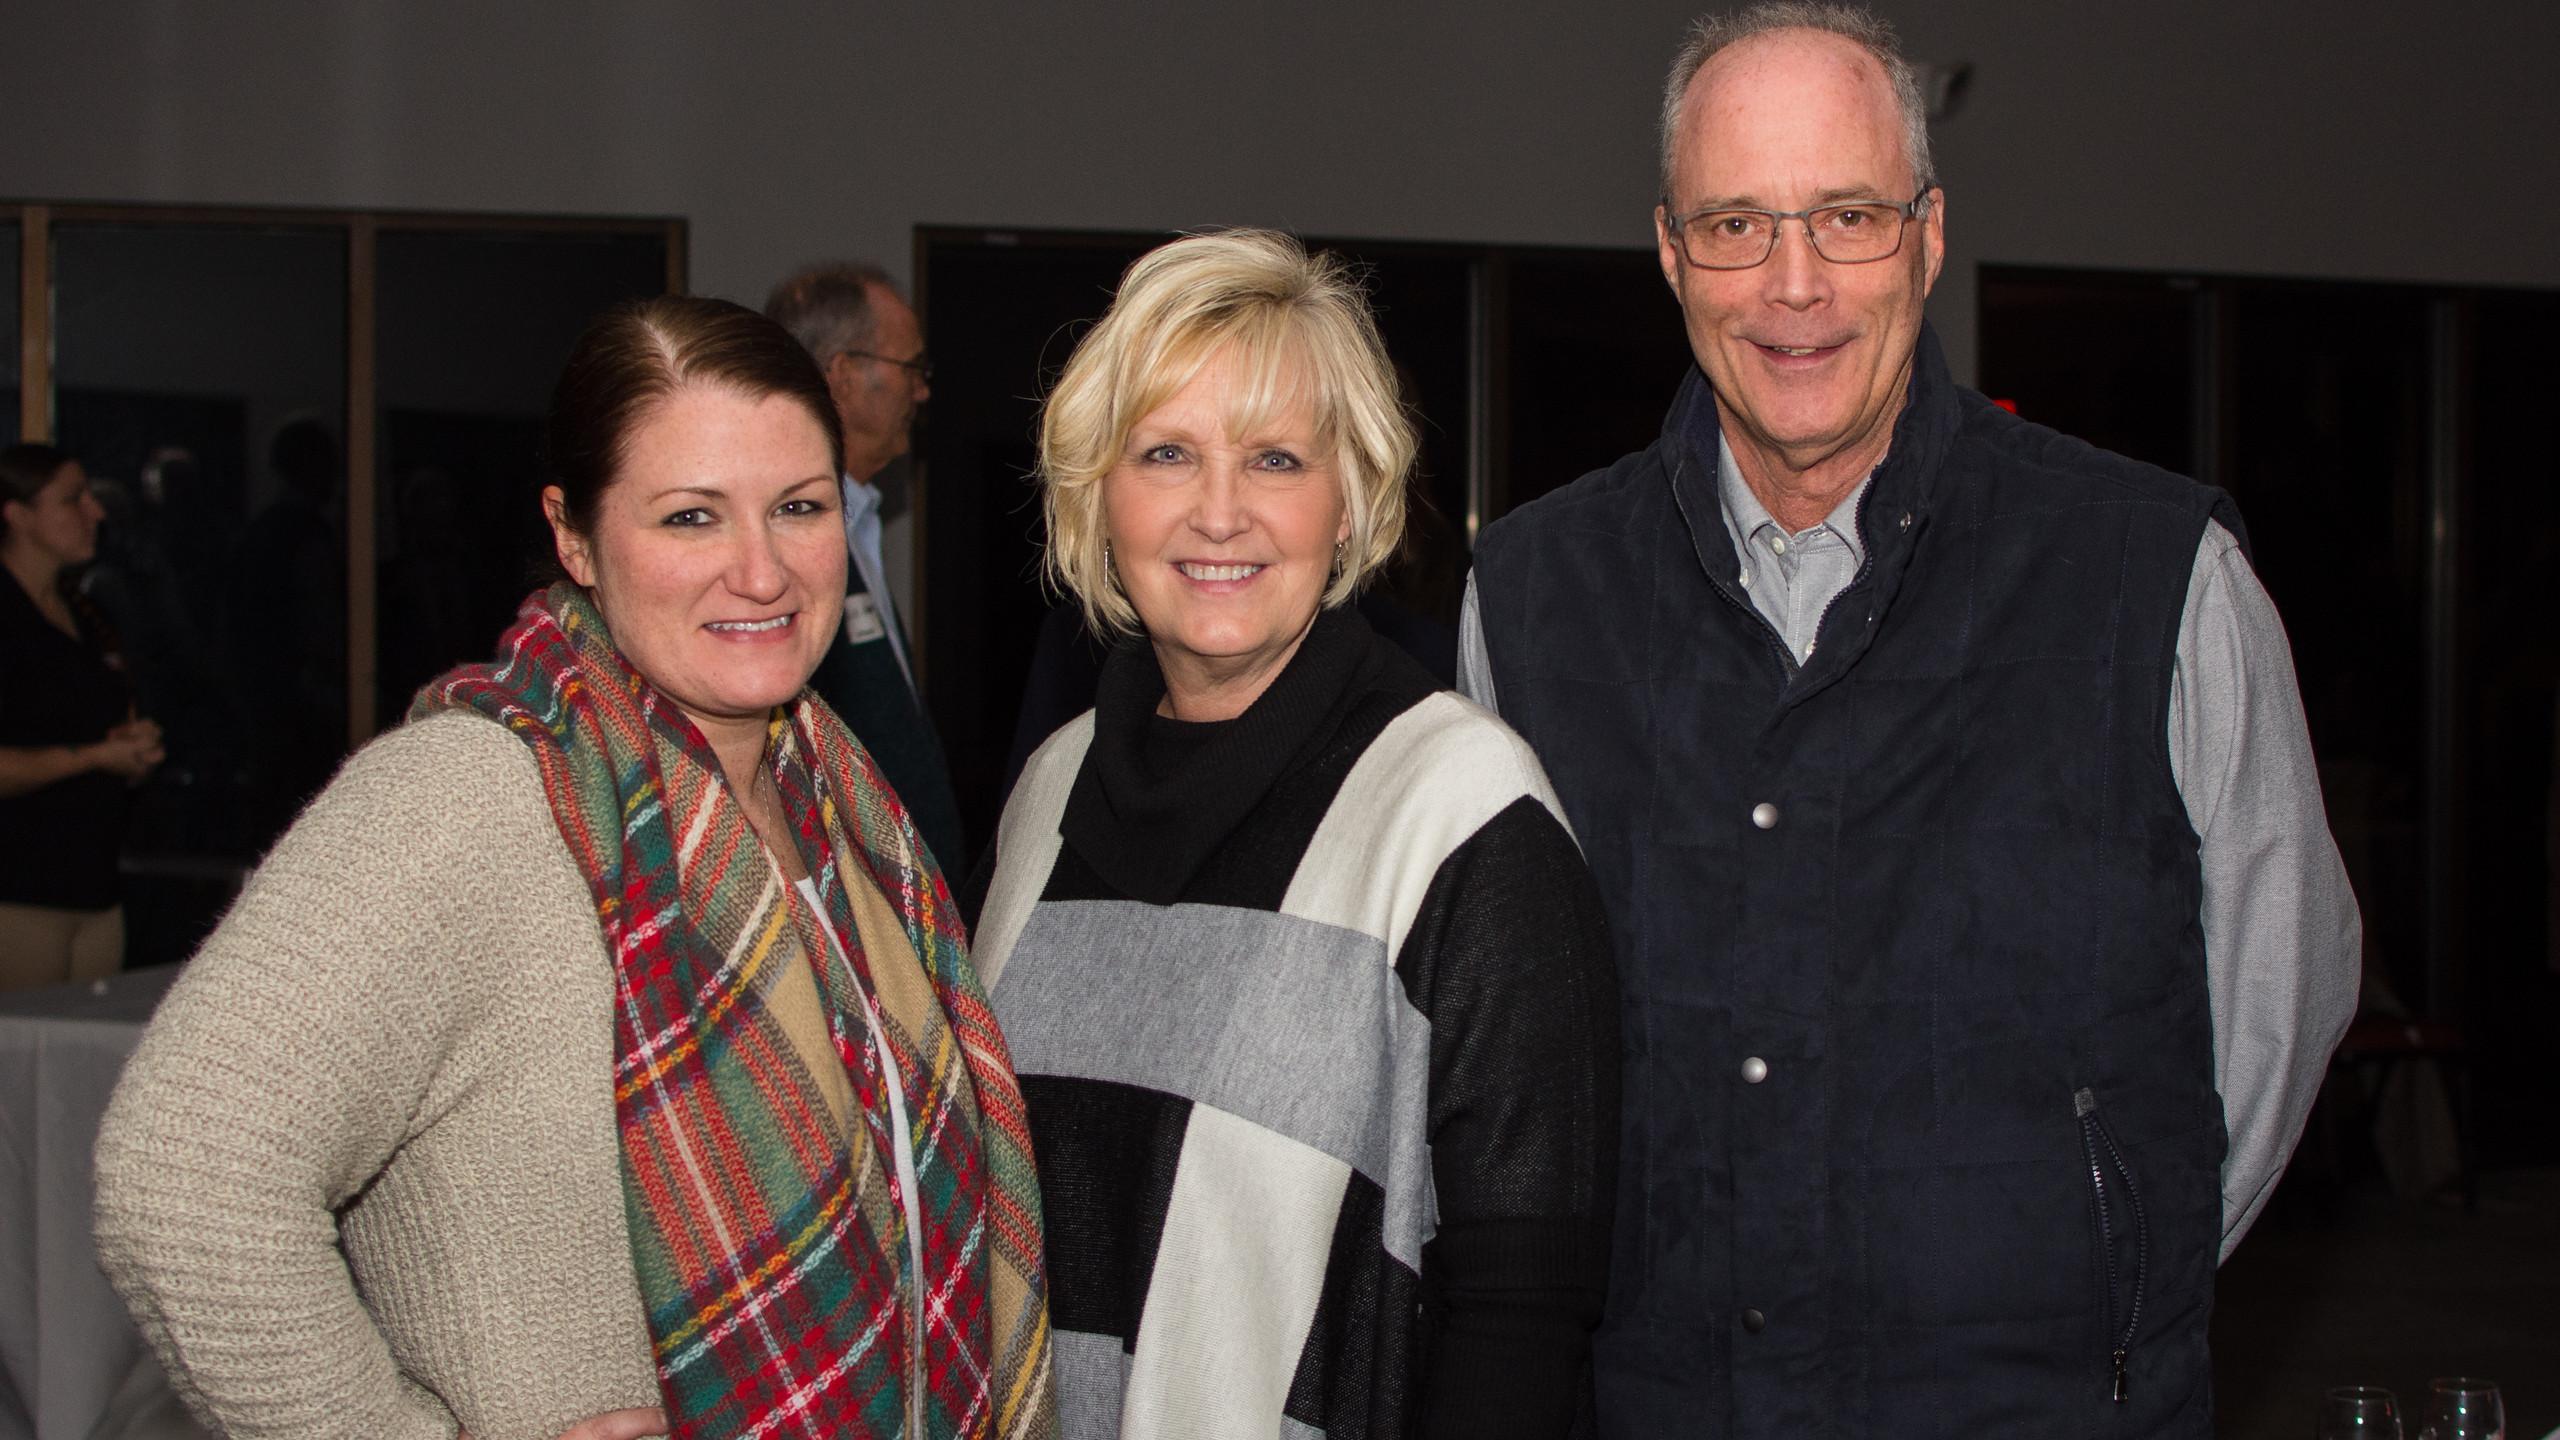 Robin Burton, Melinda Shepard, and Bill